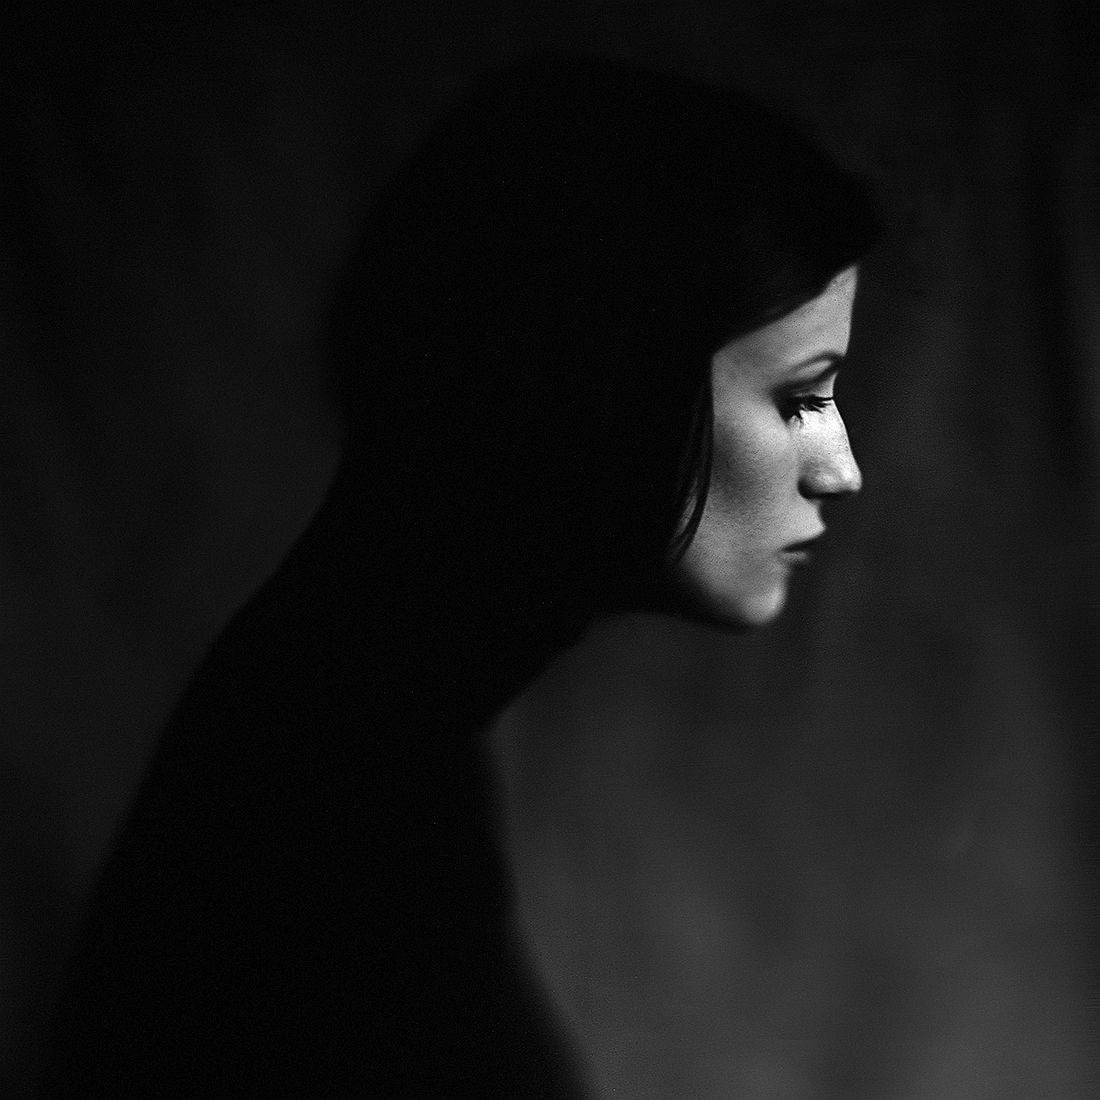 rafal-kazmierczak-nude-portrait-photographer-12